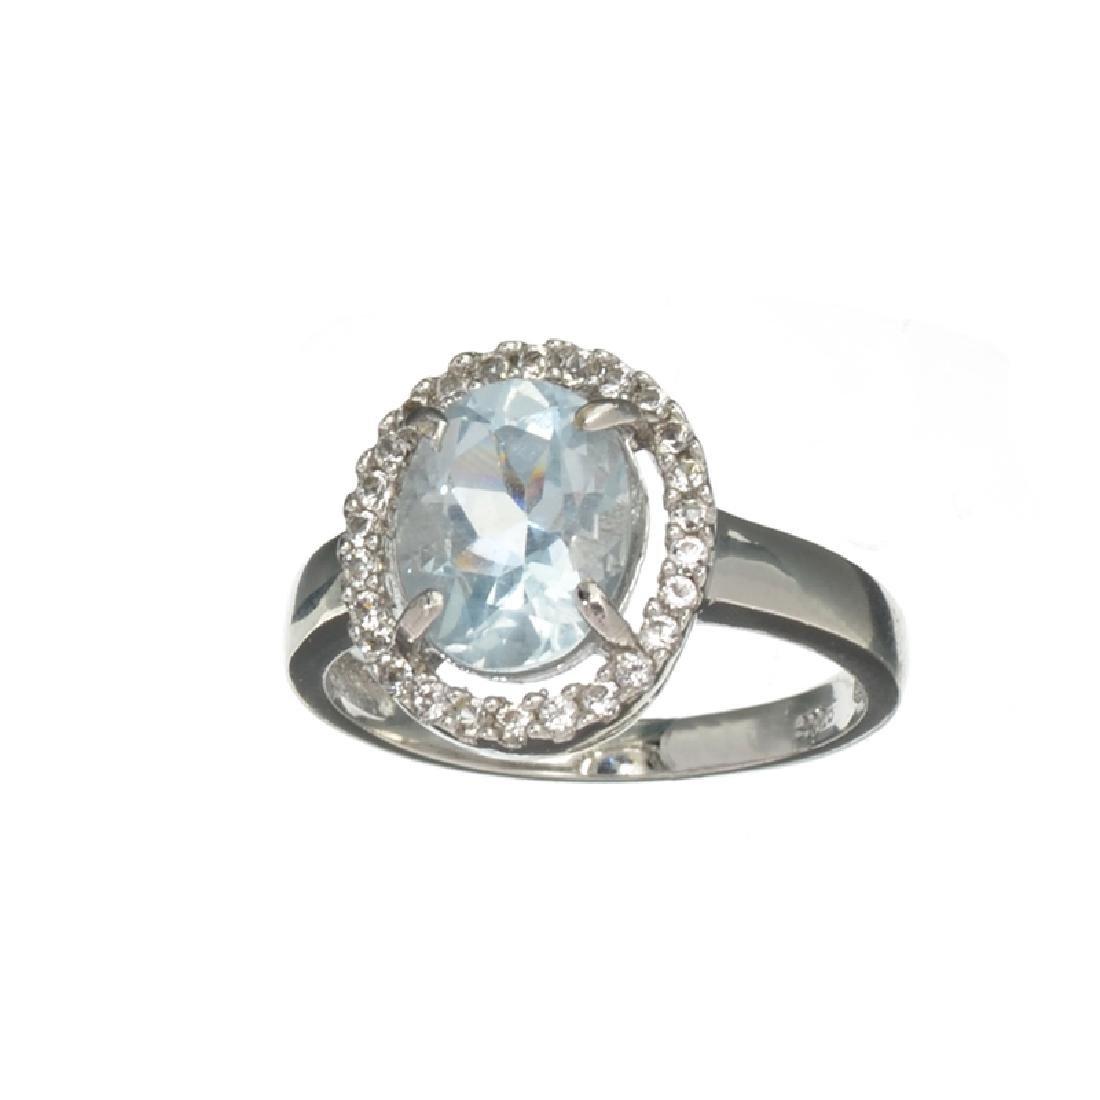 APP: 0.9k Fine Jewelry 1.30CT Oval Cut Aquamarine